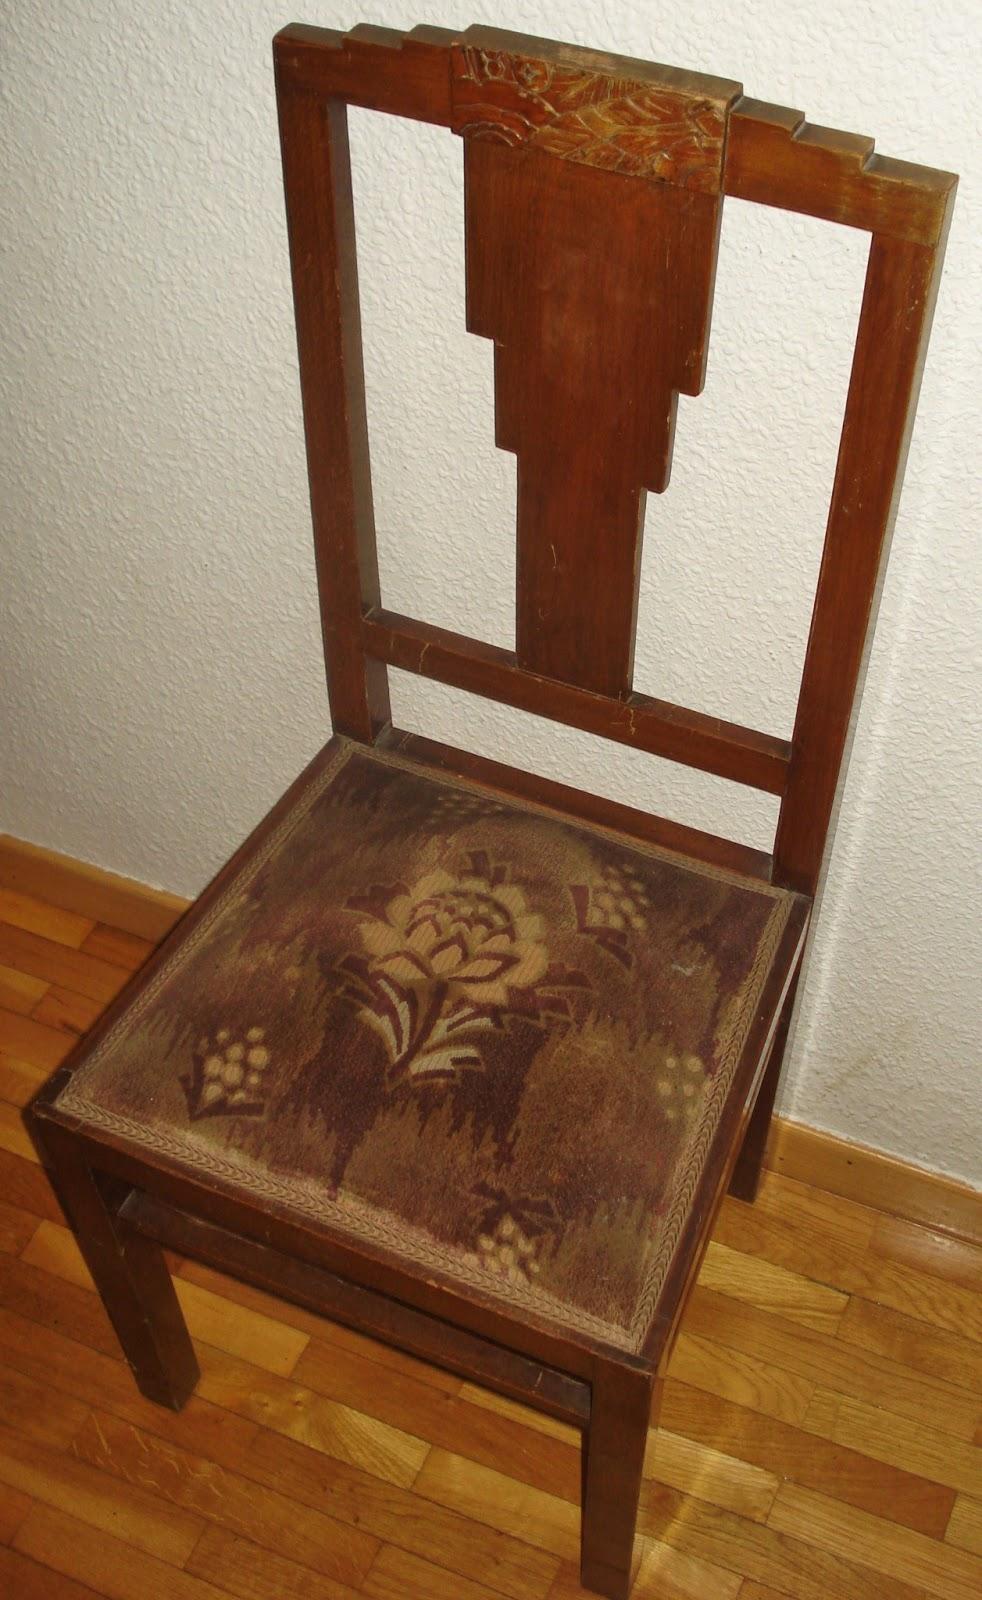 Madrid art dec muebles - Art deco muebles ...